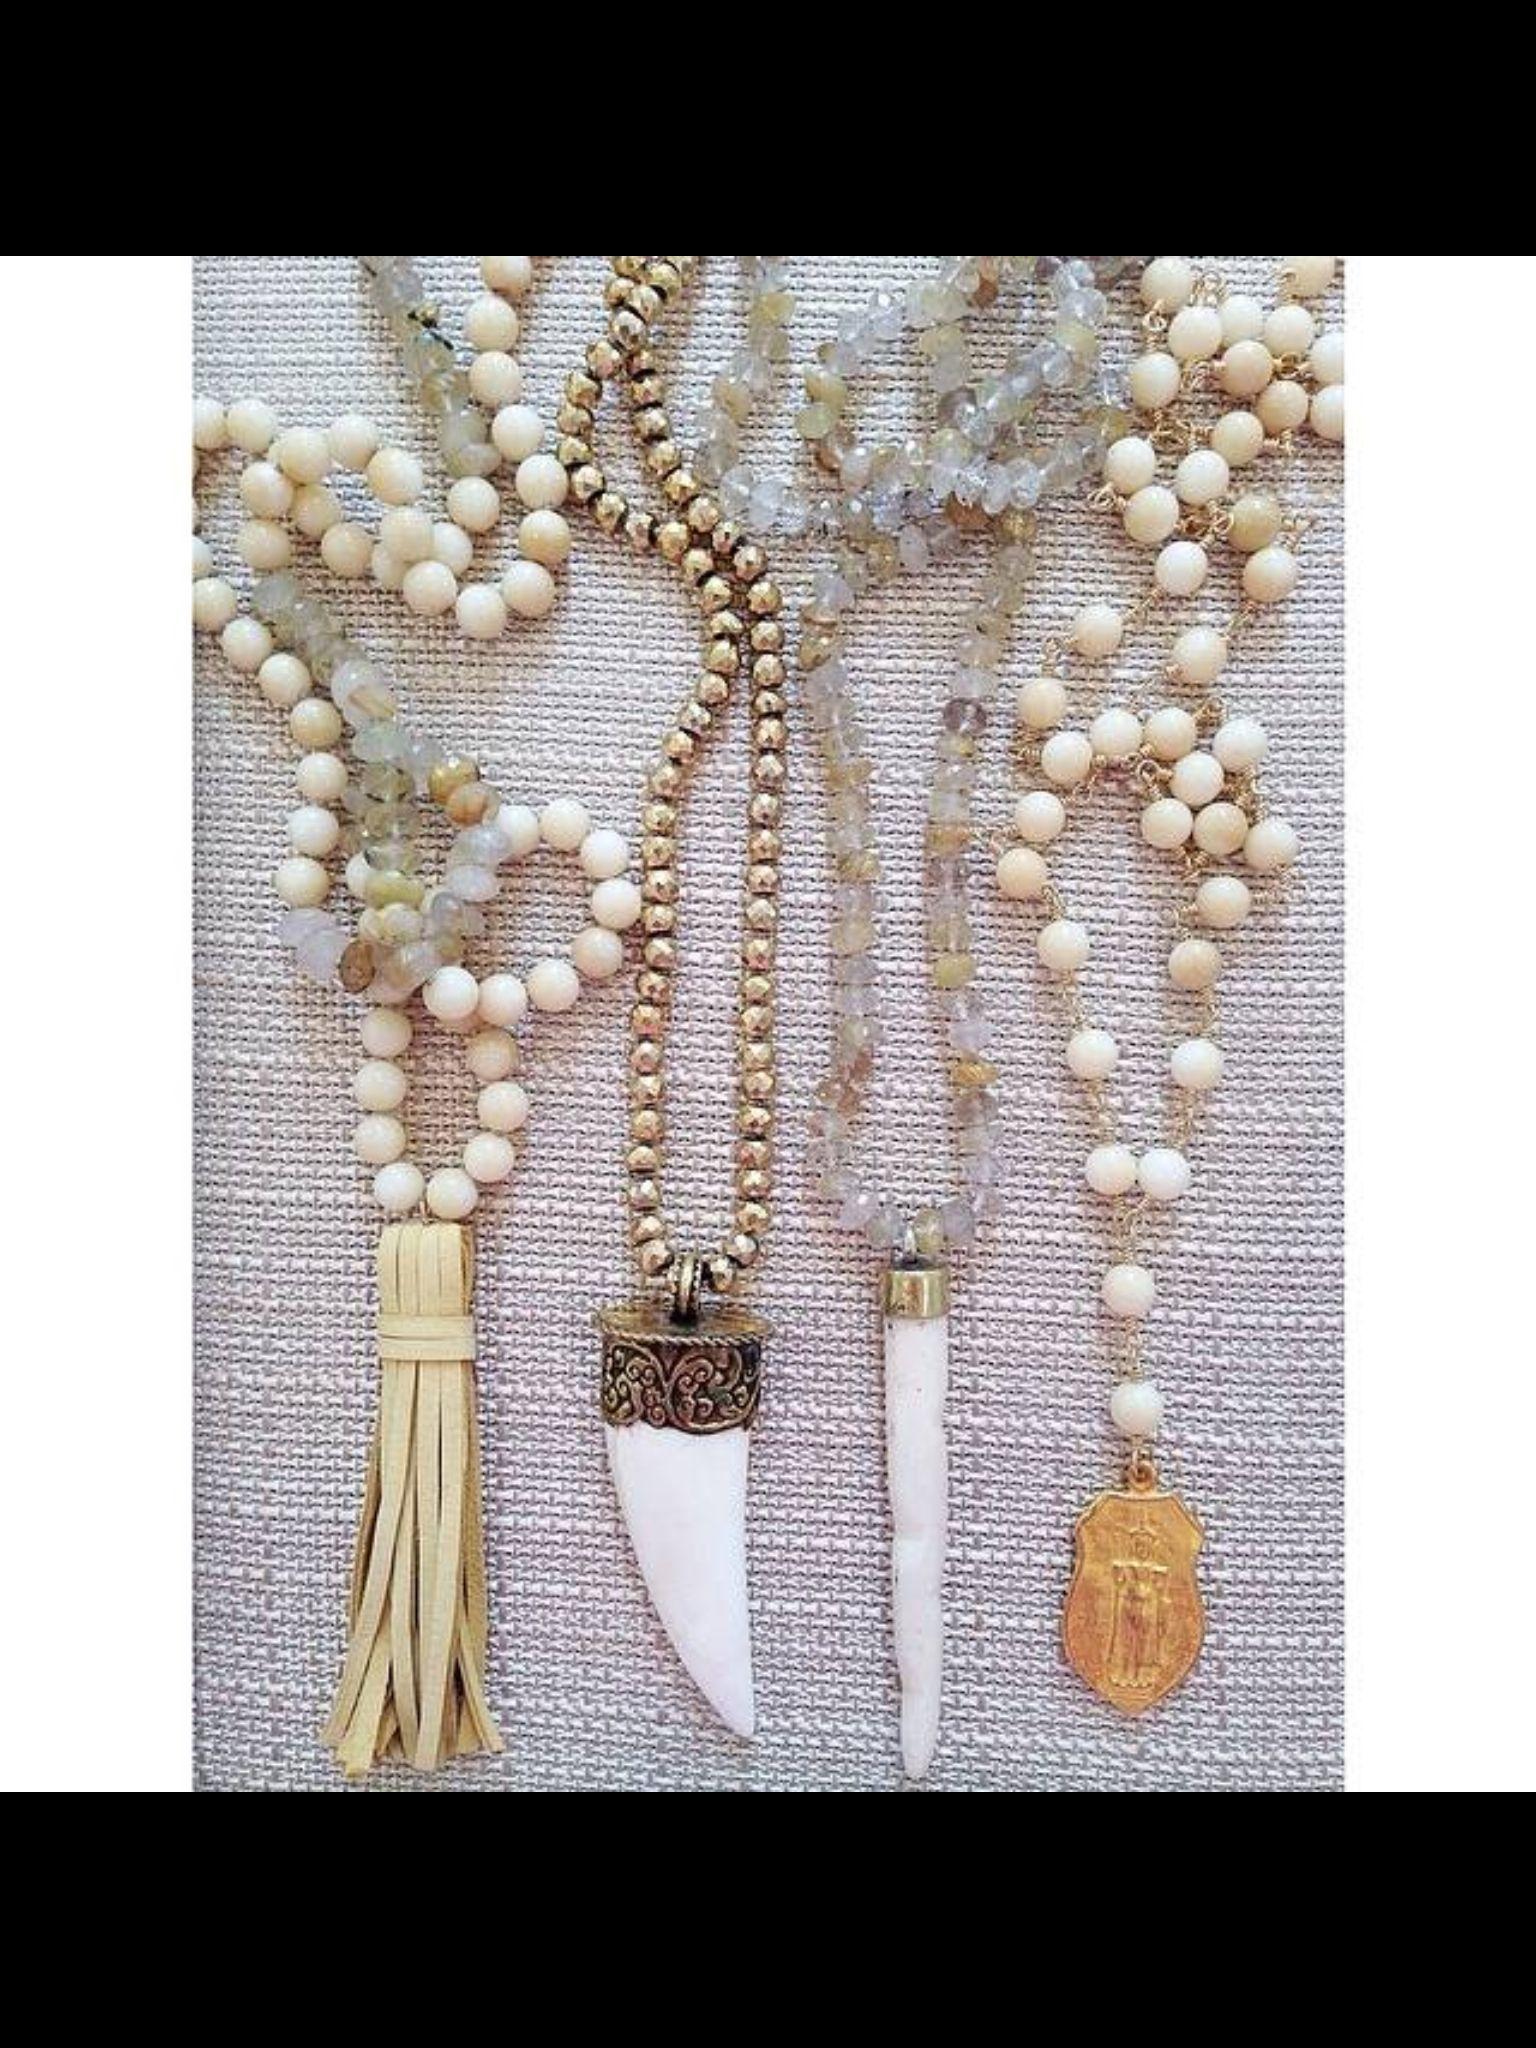 Frasier Sterling Jewelry!!! Amazing!!!